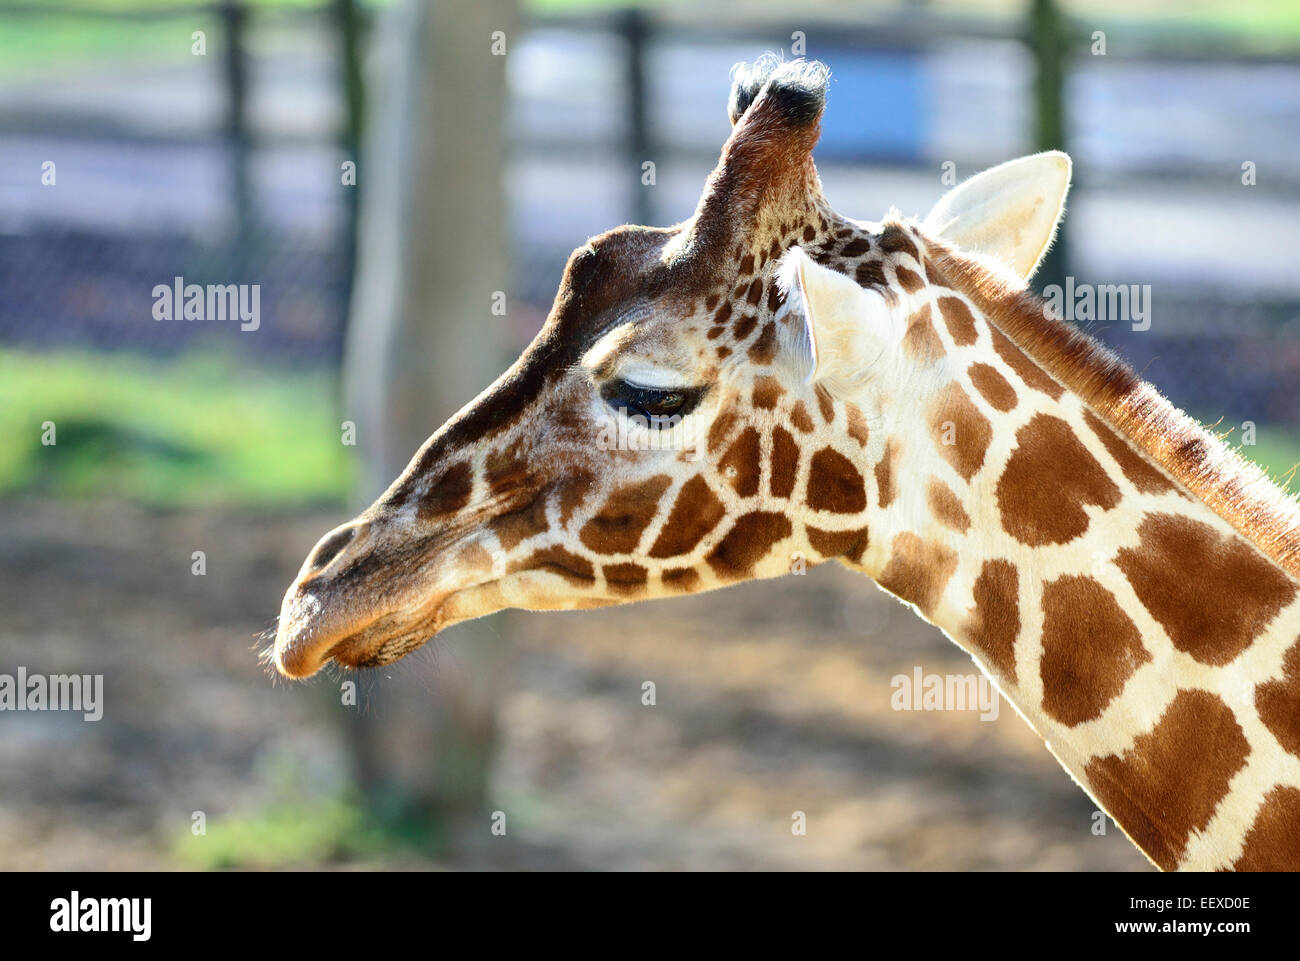 Giraffe head - Stock Image